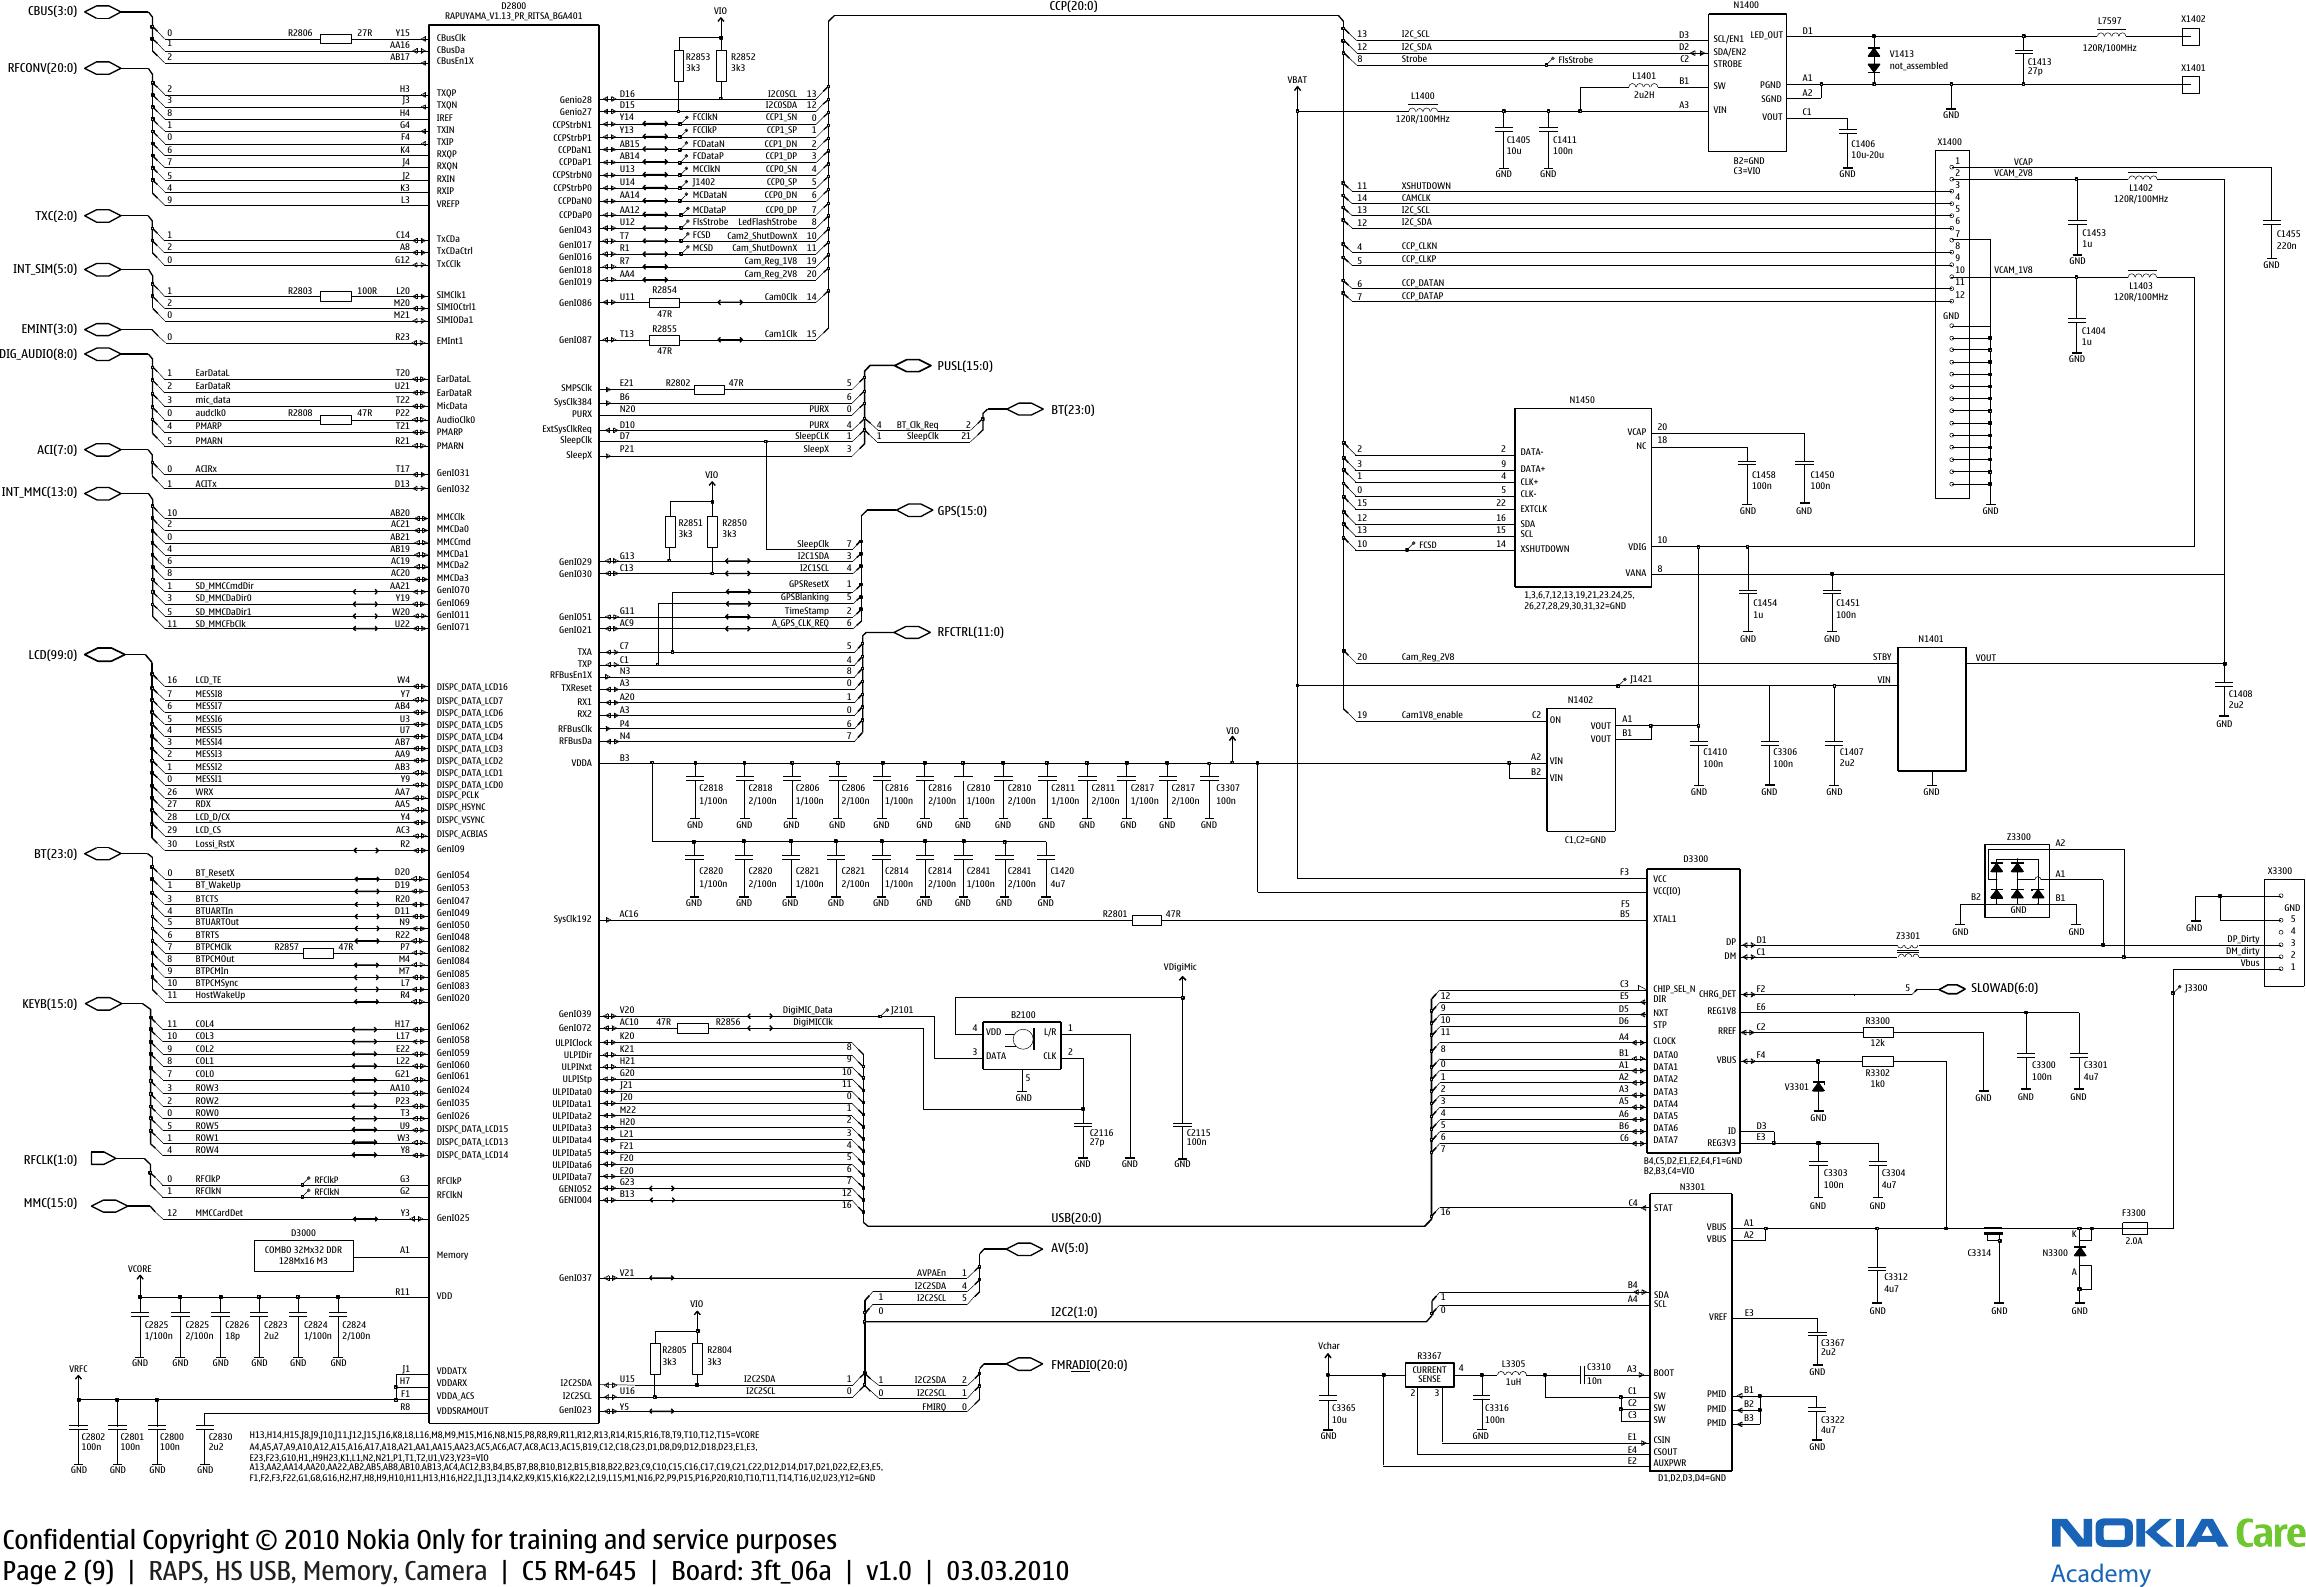 Nokia C5 00 RM 645 Service Schematics. Www.s manuals.com